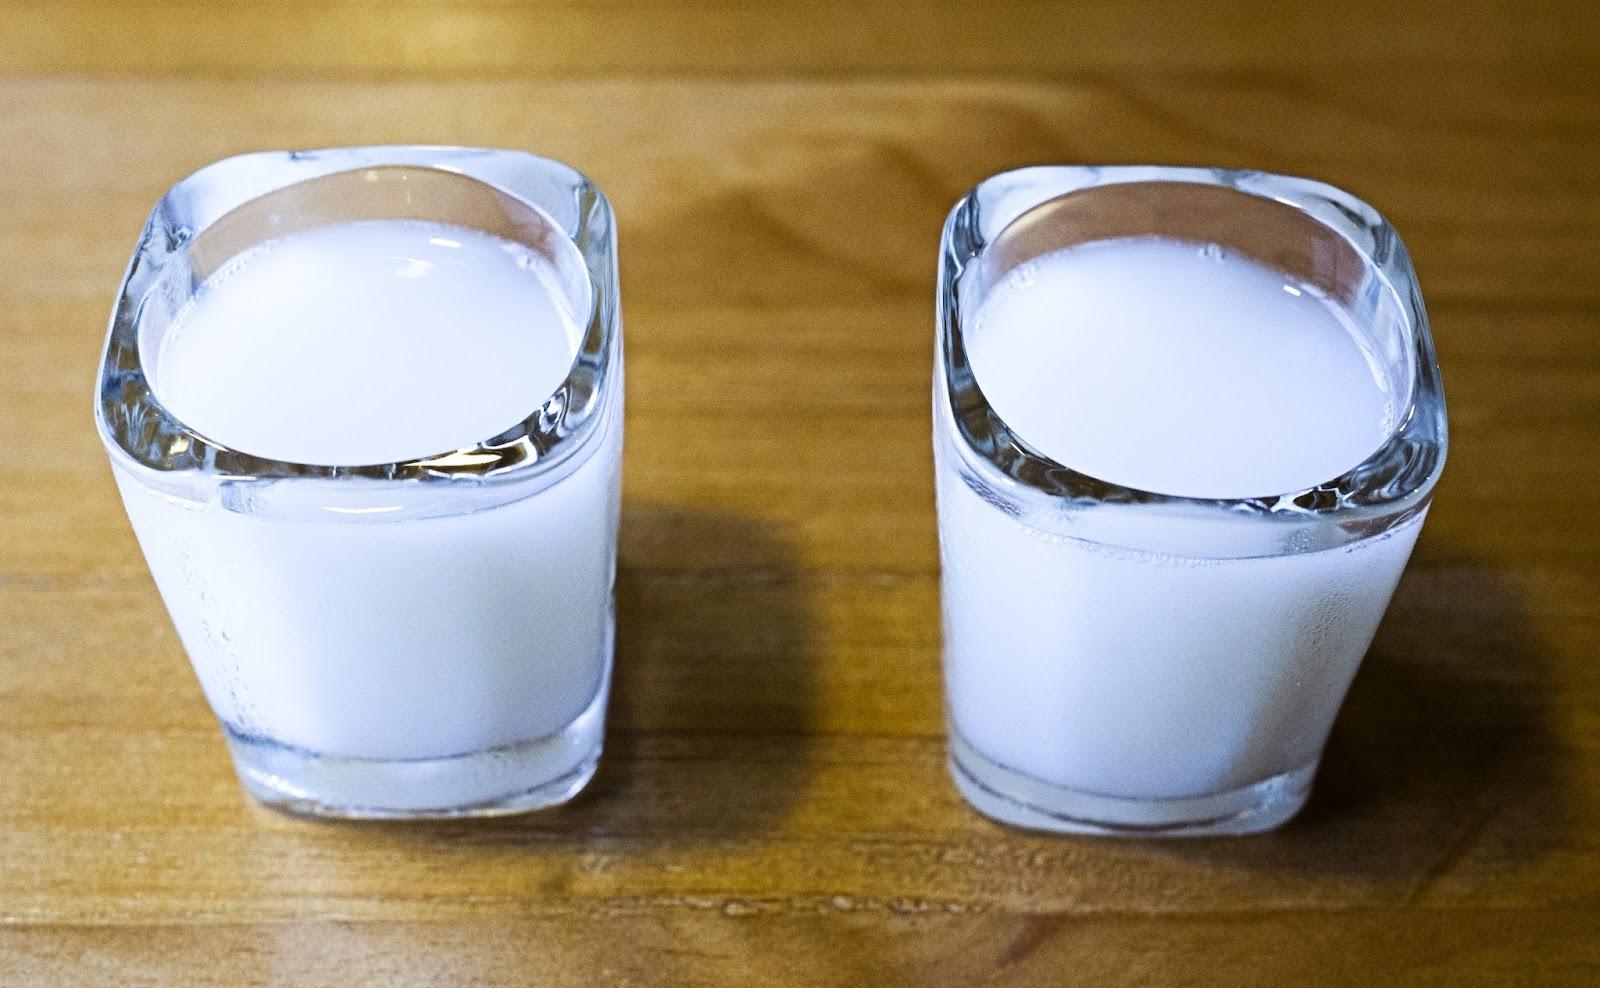 d-yogurtsoju-L1080674.jpg